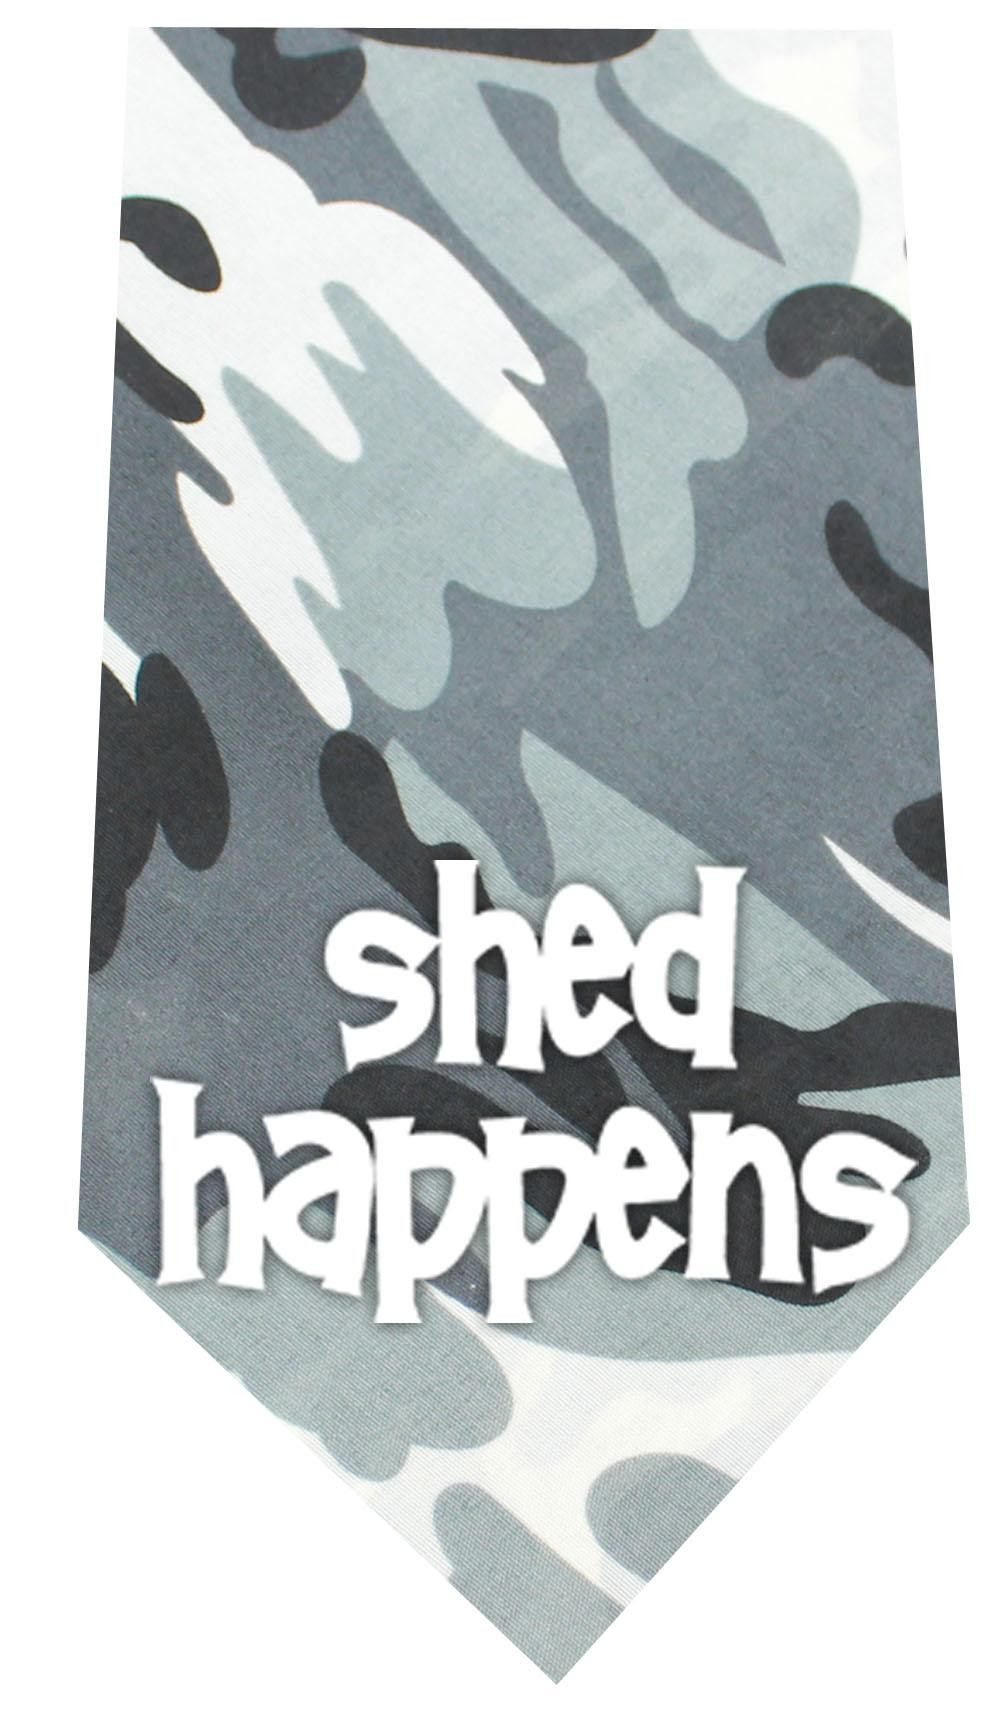 Shed Happens Screen Print Bandana Grey Camo